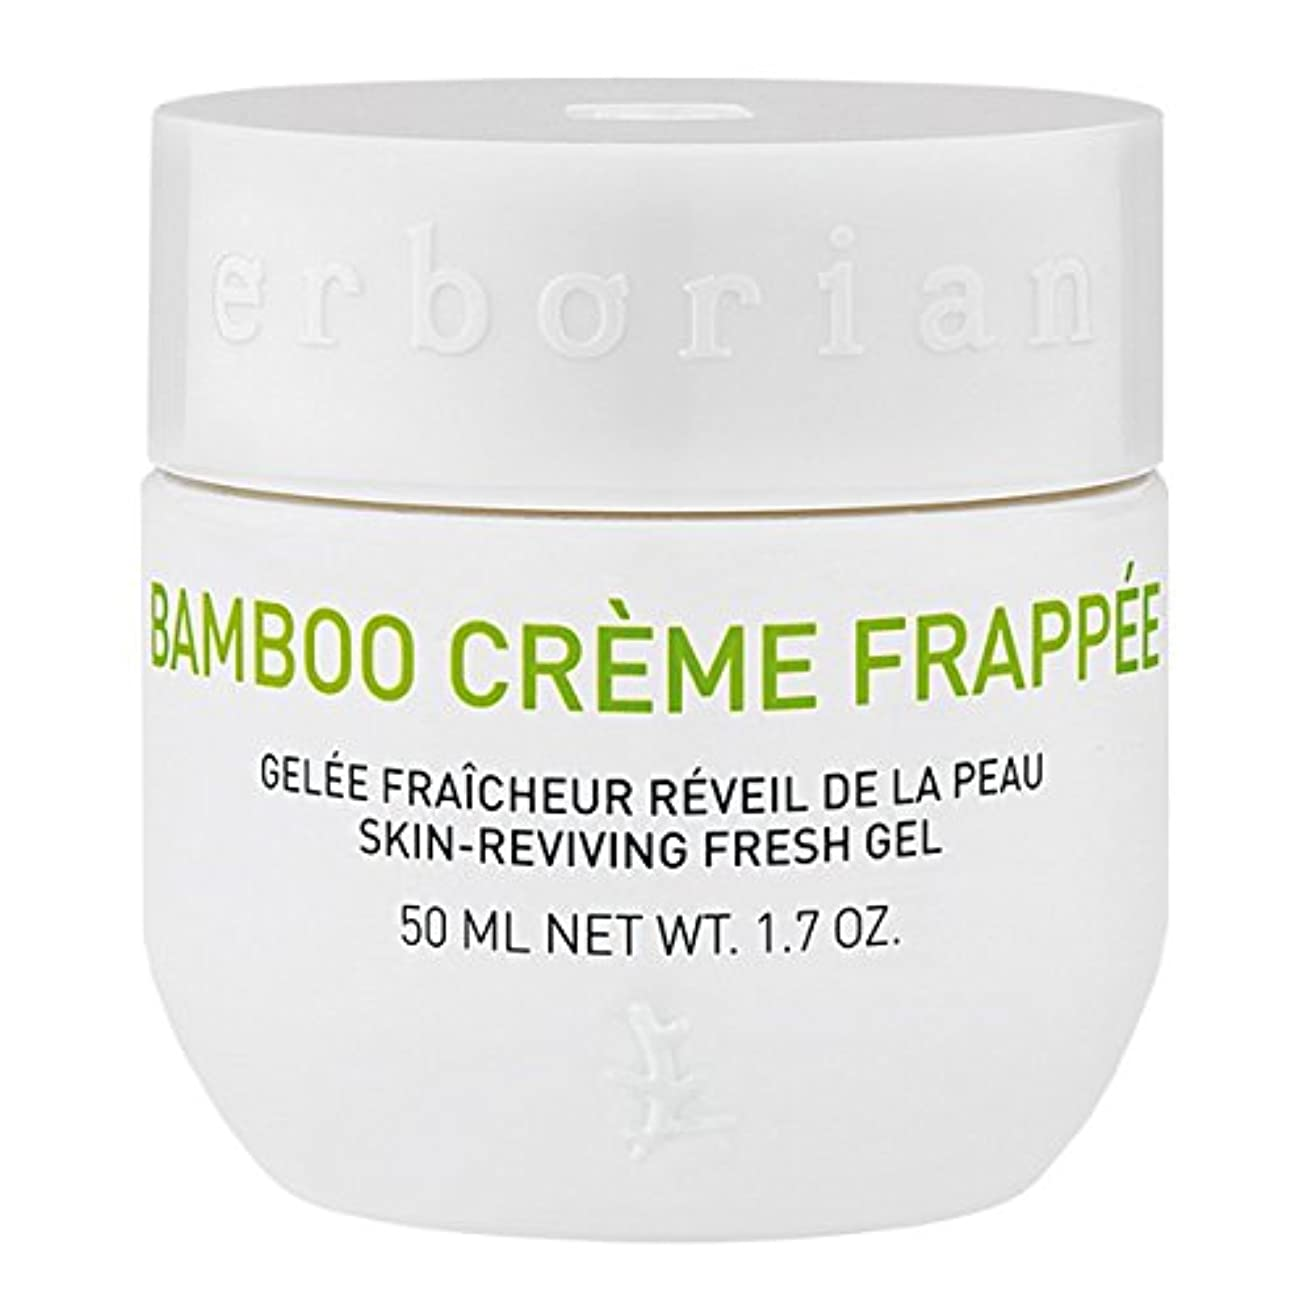 Erborian Bamboo Creme Frappee 50ml [並行輸入品]